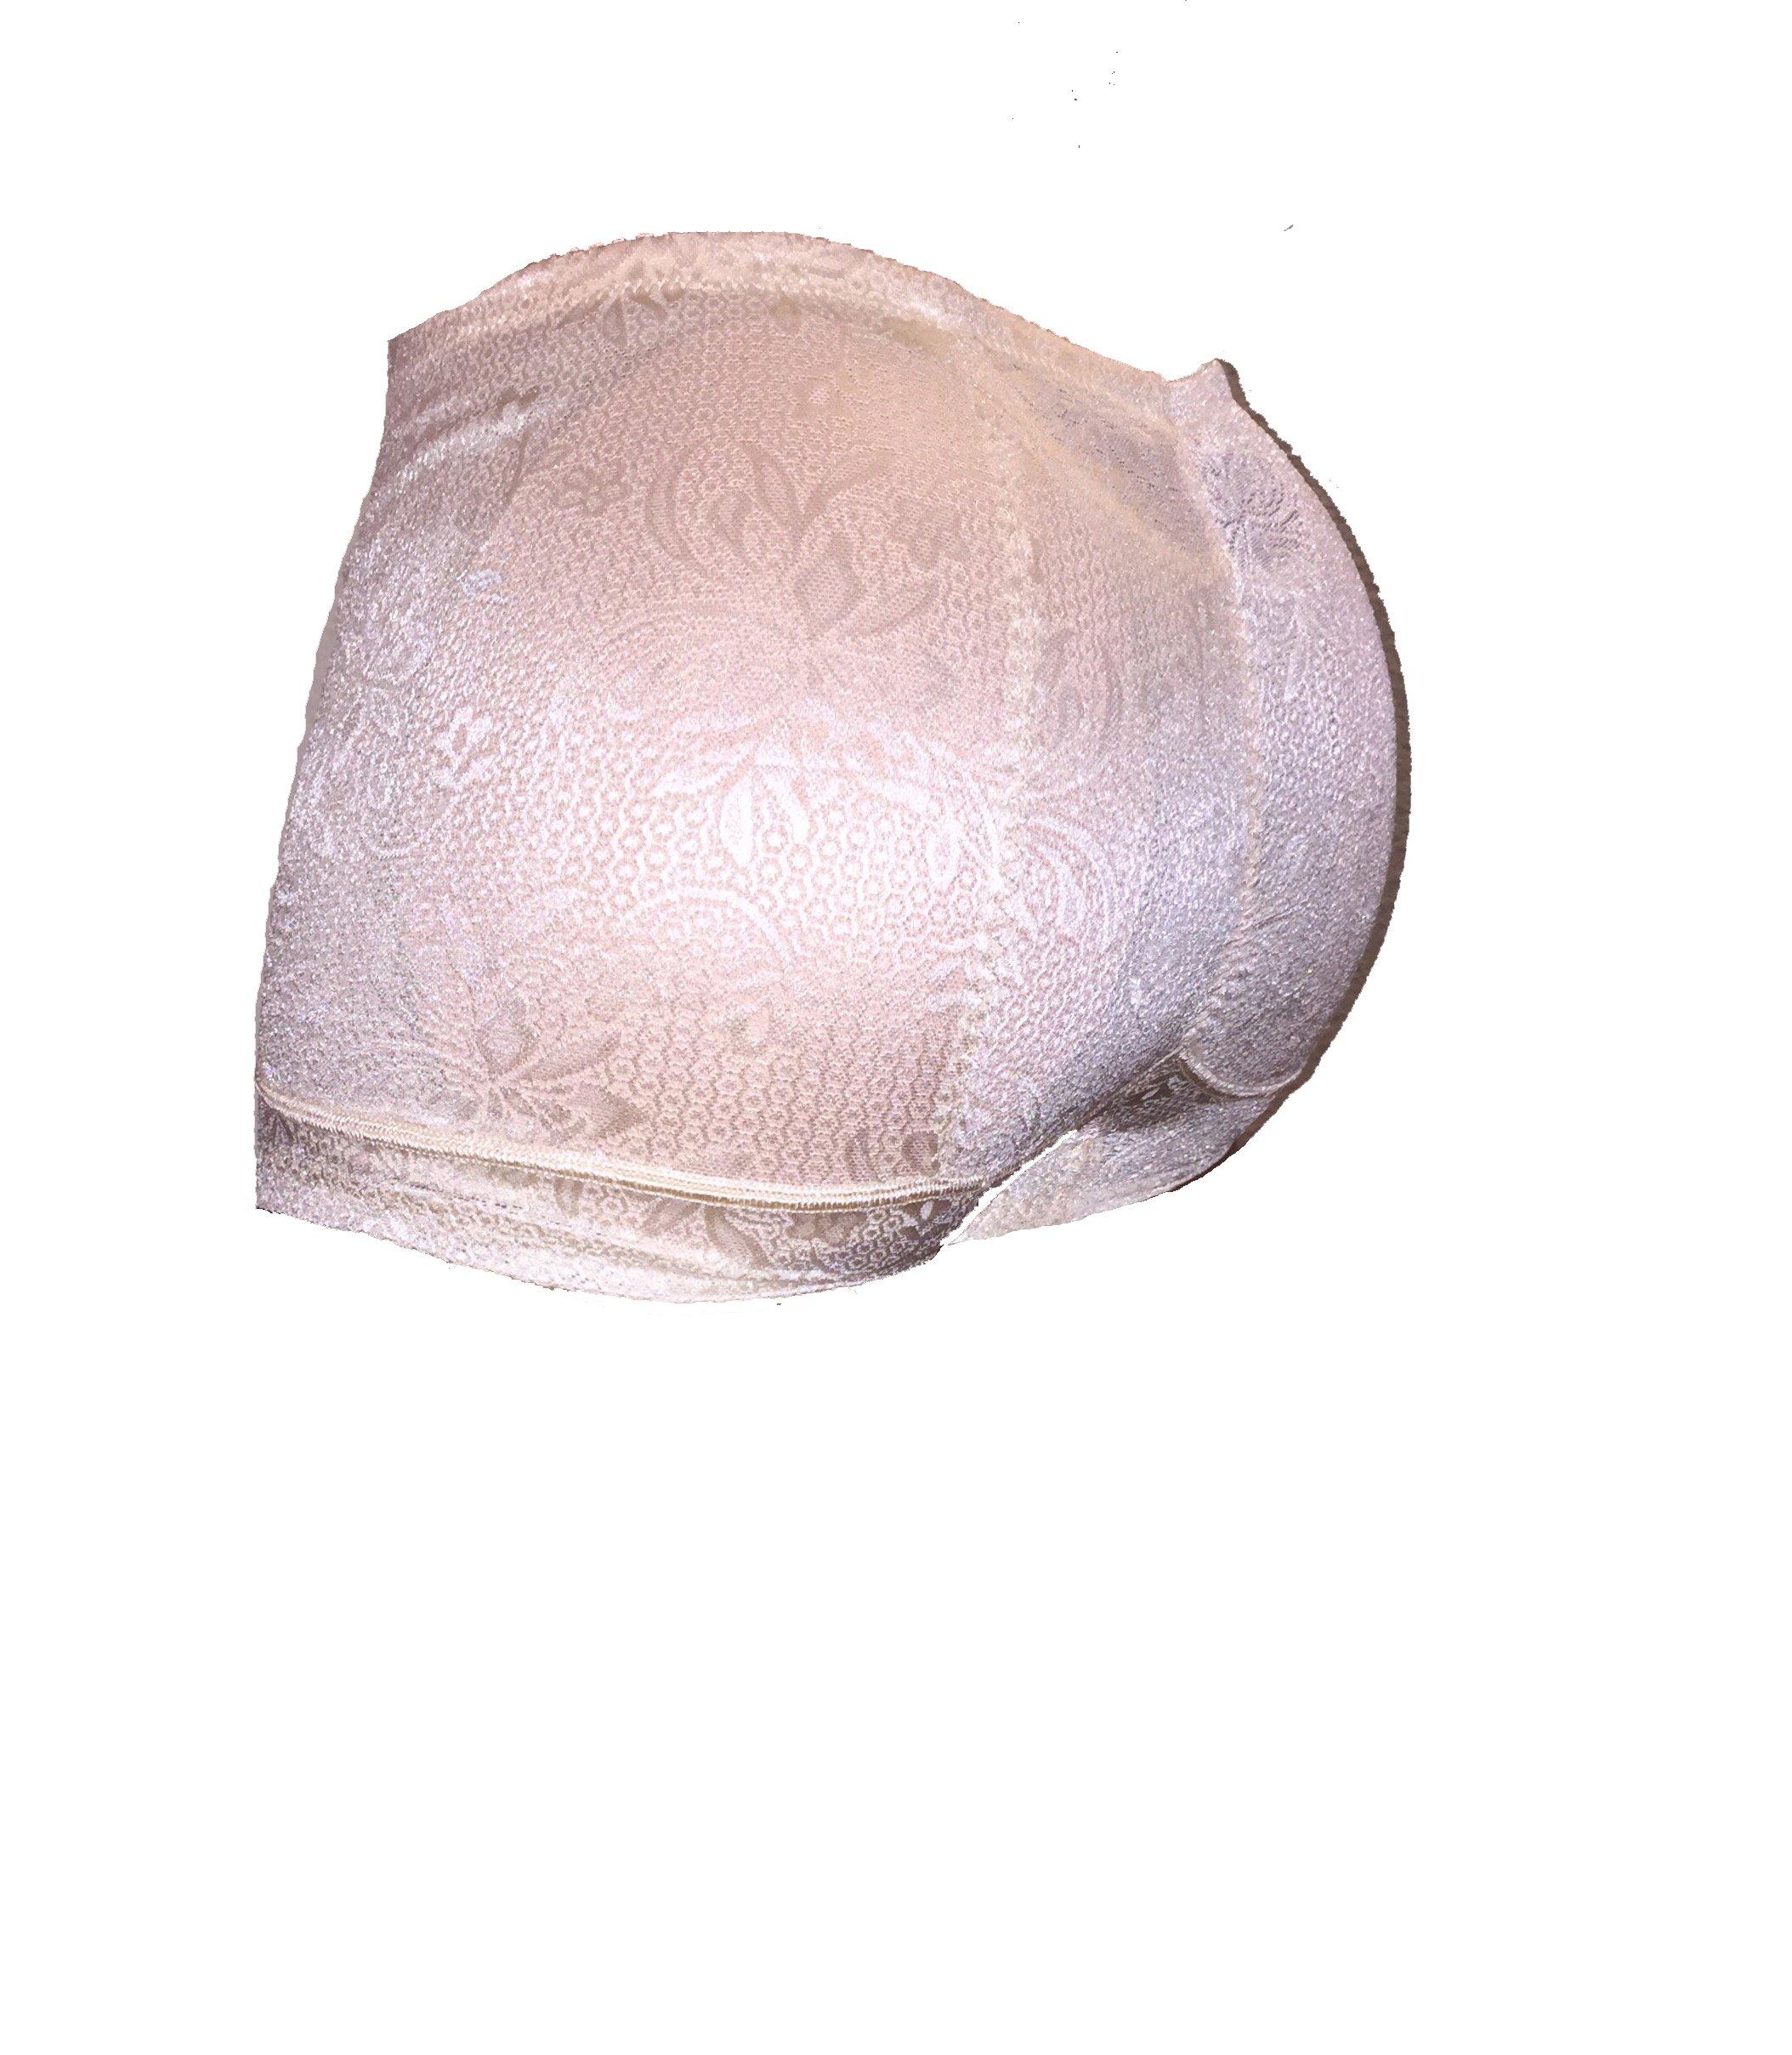 Valentina L.A. Perky Breathable Padded Panty Lift and Enhancer Small/Medium (Nude)